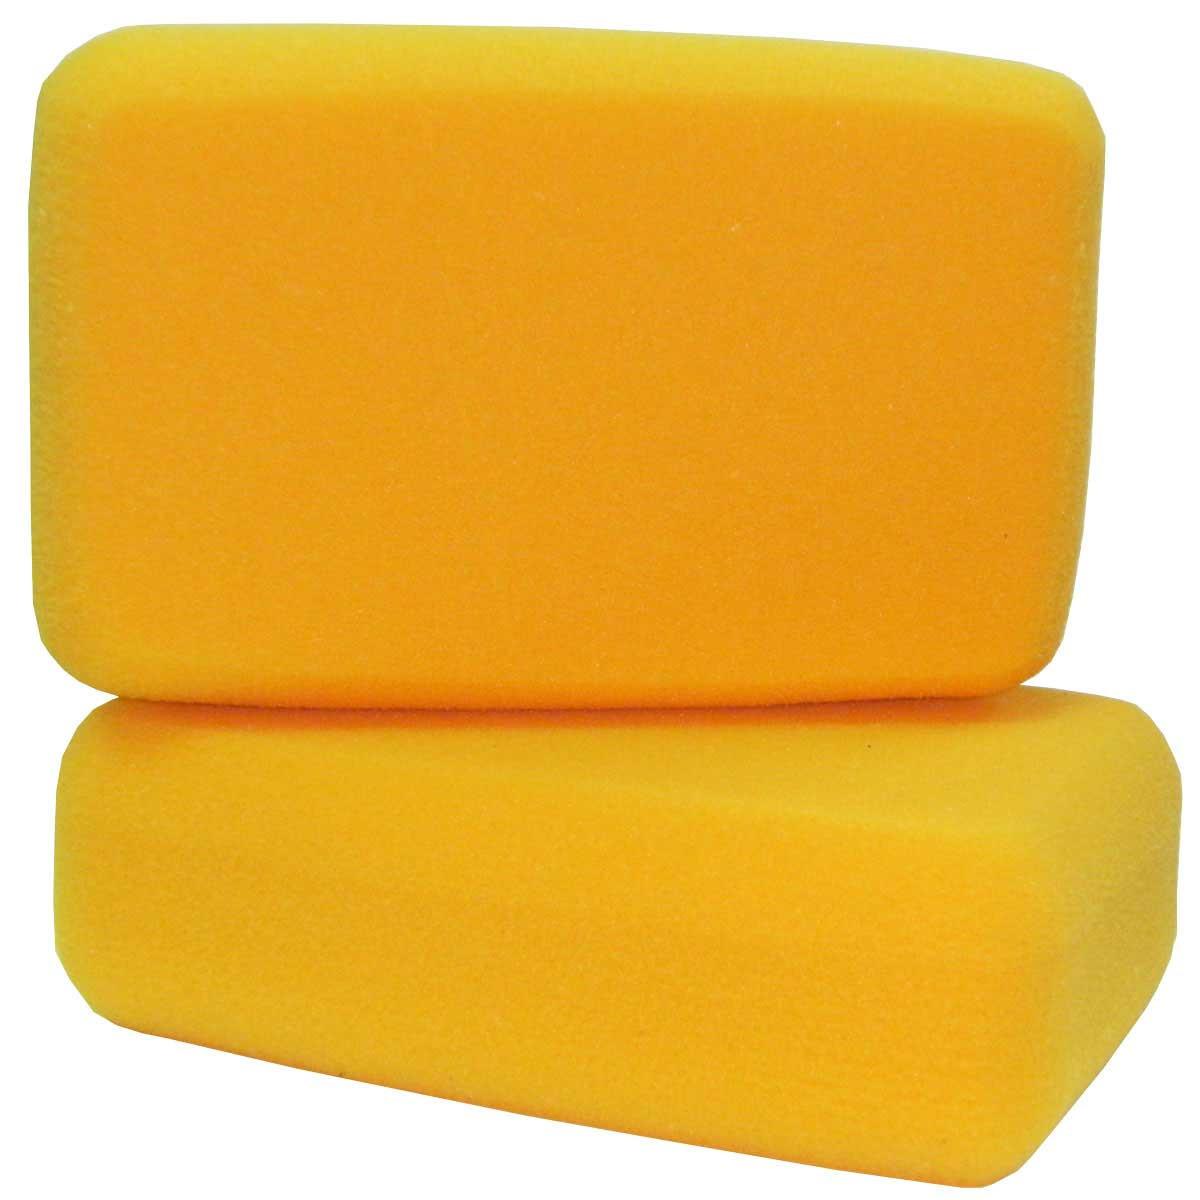 Hydra XL Grout Sponge 100 Piece